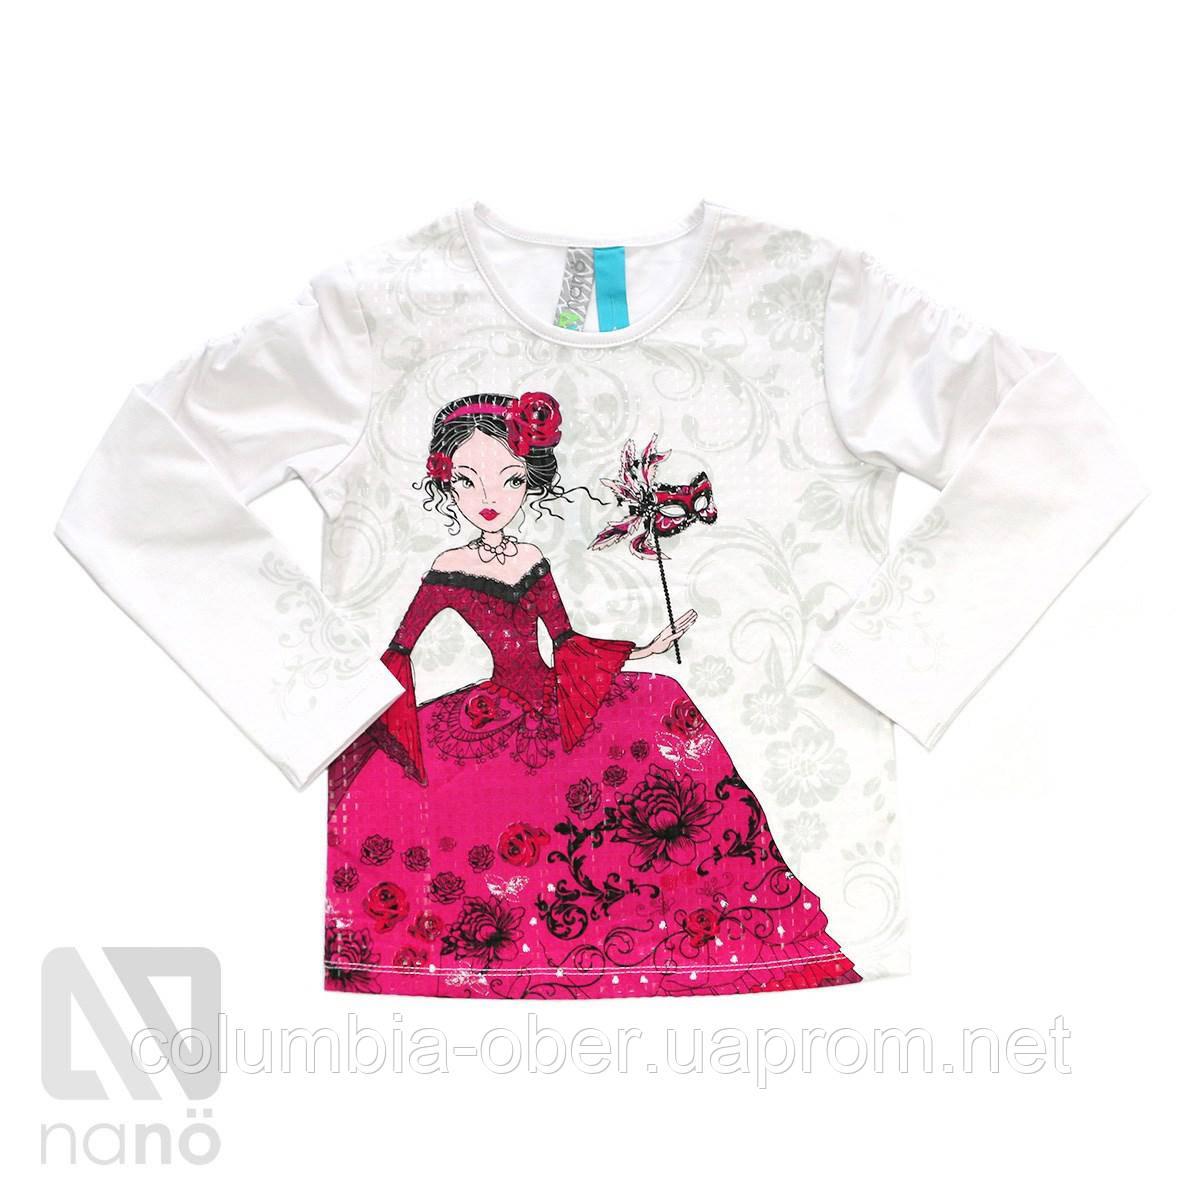 Блуза для девочки Nano F1424-09 White. Размеры 92-142.